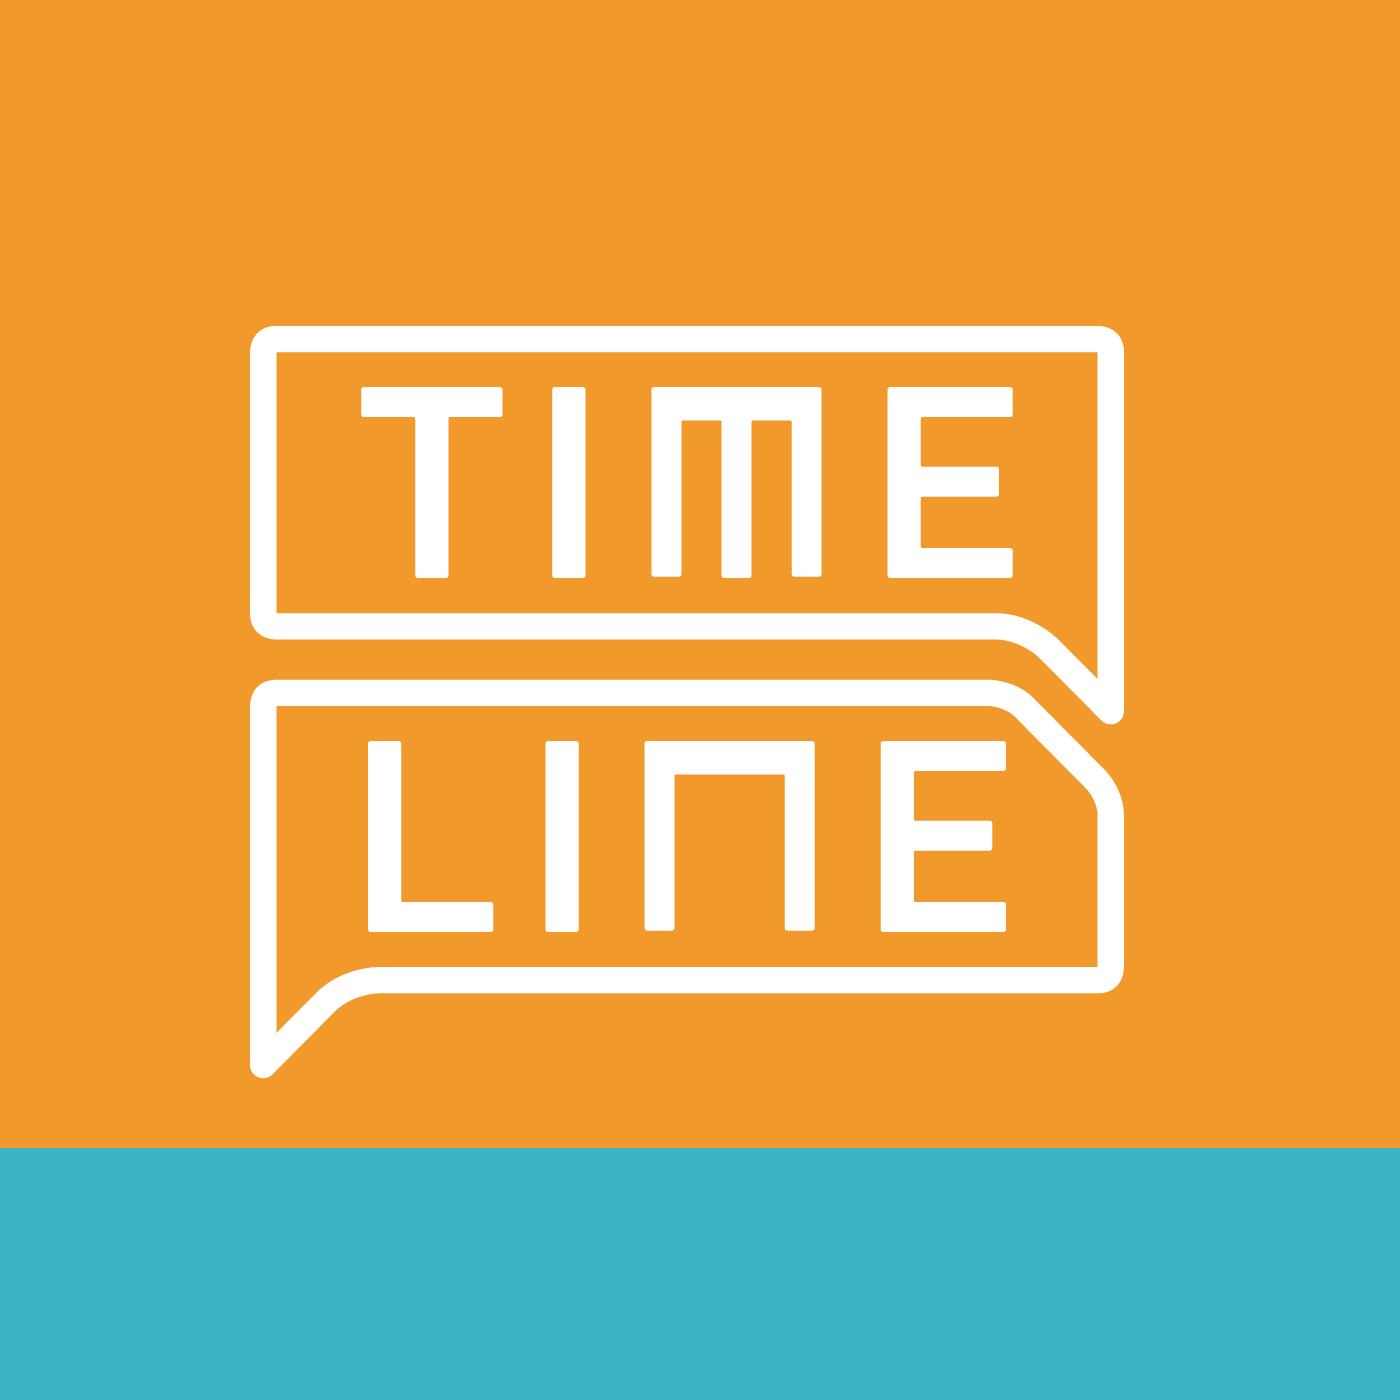 Timeline Gaúcha 19.02.2018